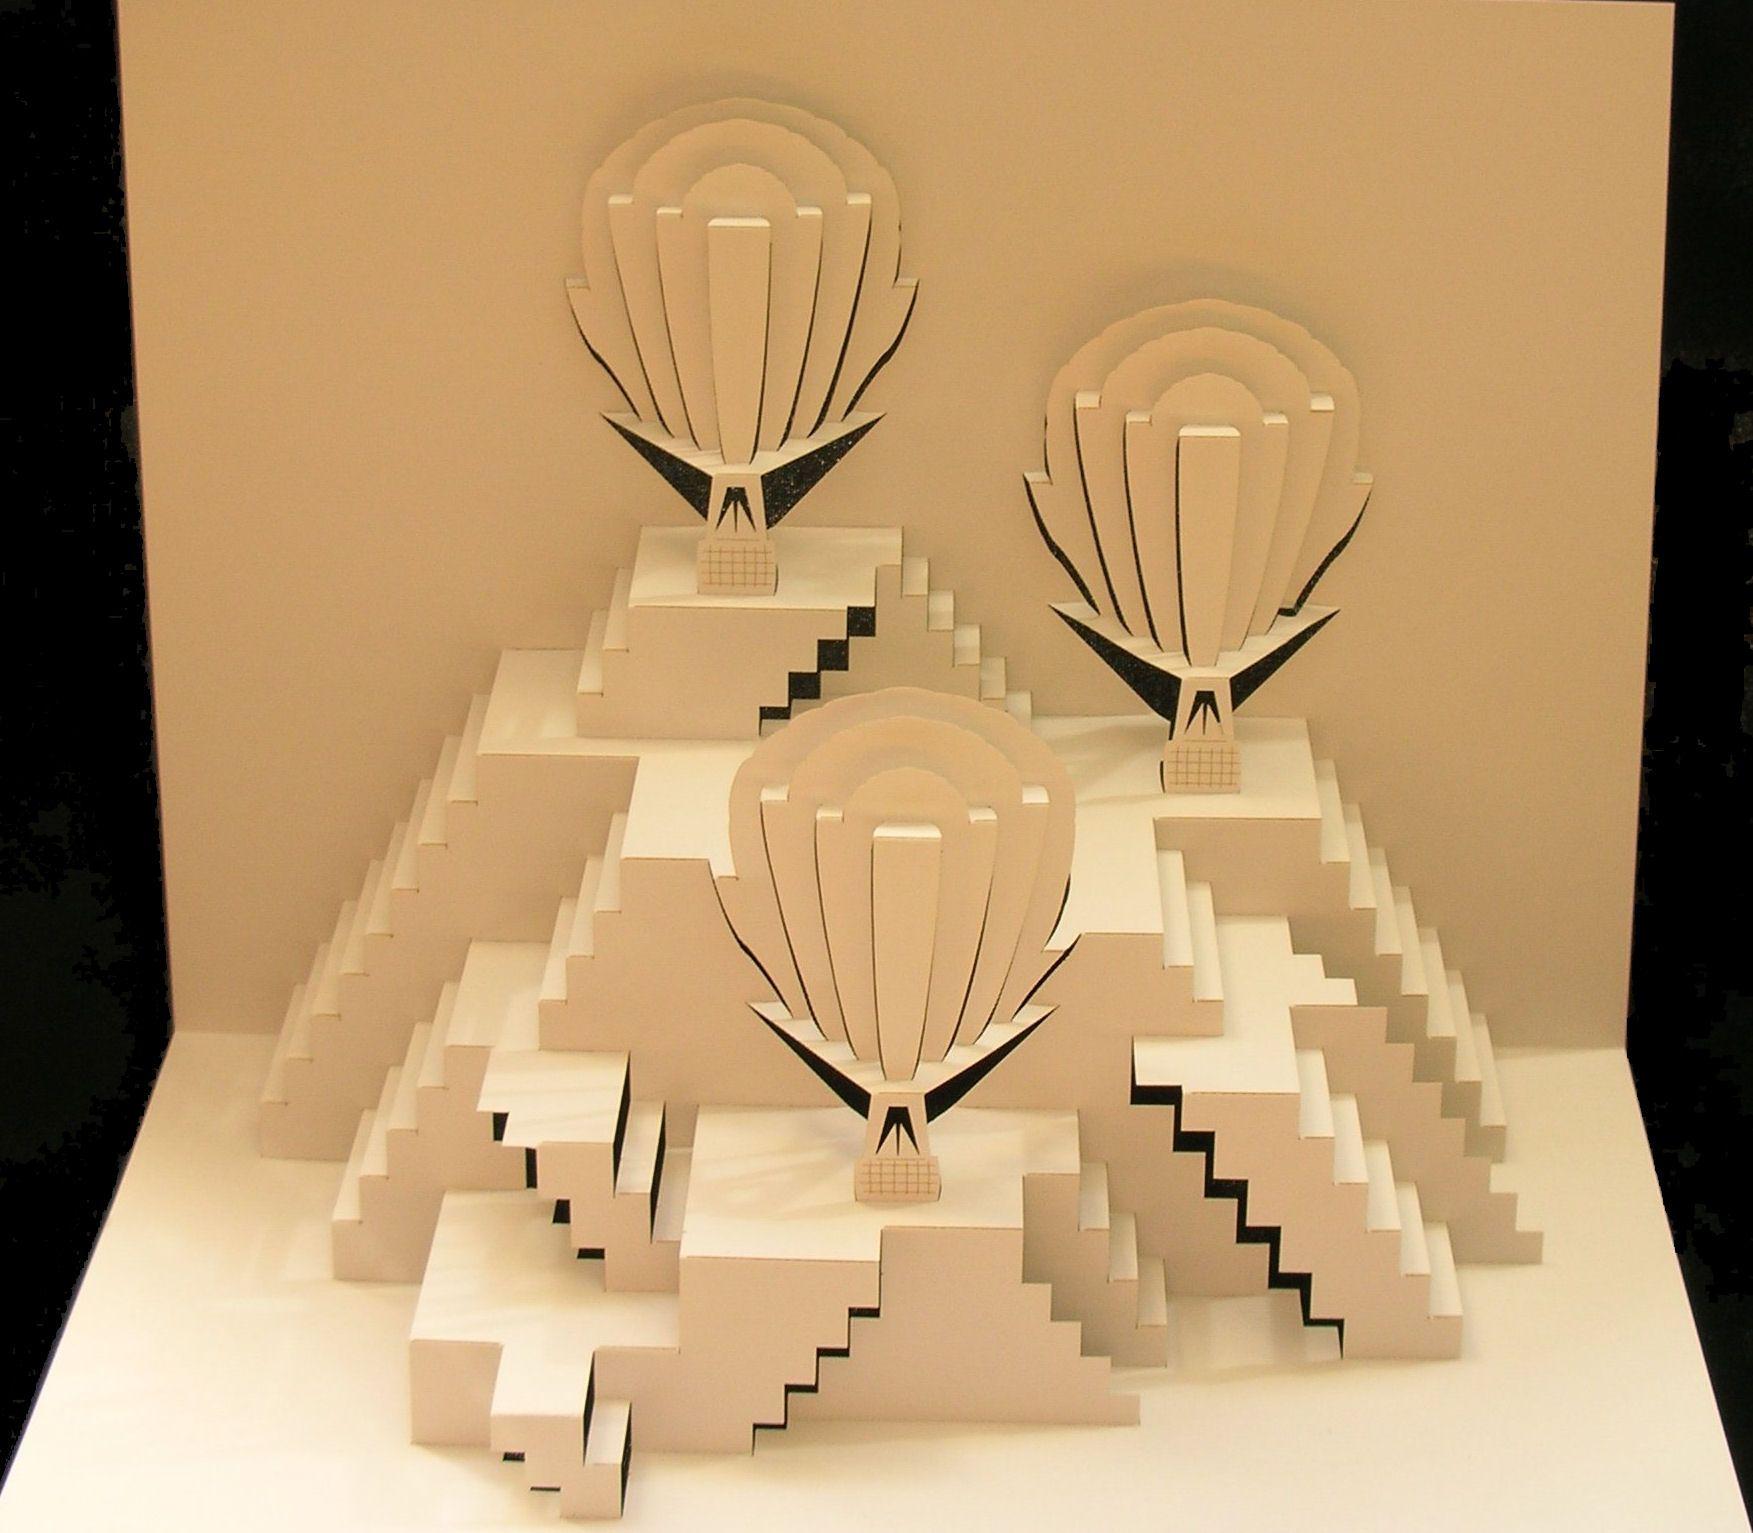 ingrid siliakus templates - ingrid siliakus uiteindelijk resultaat papel papier